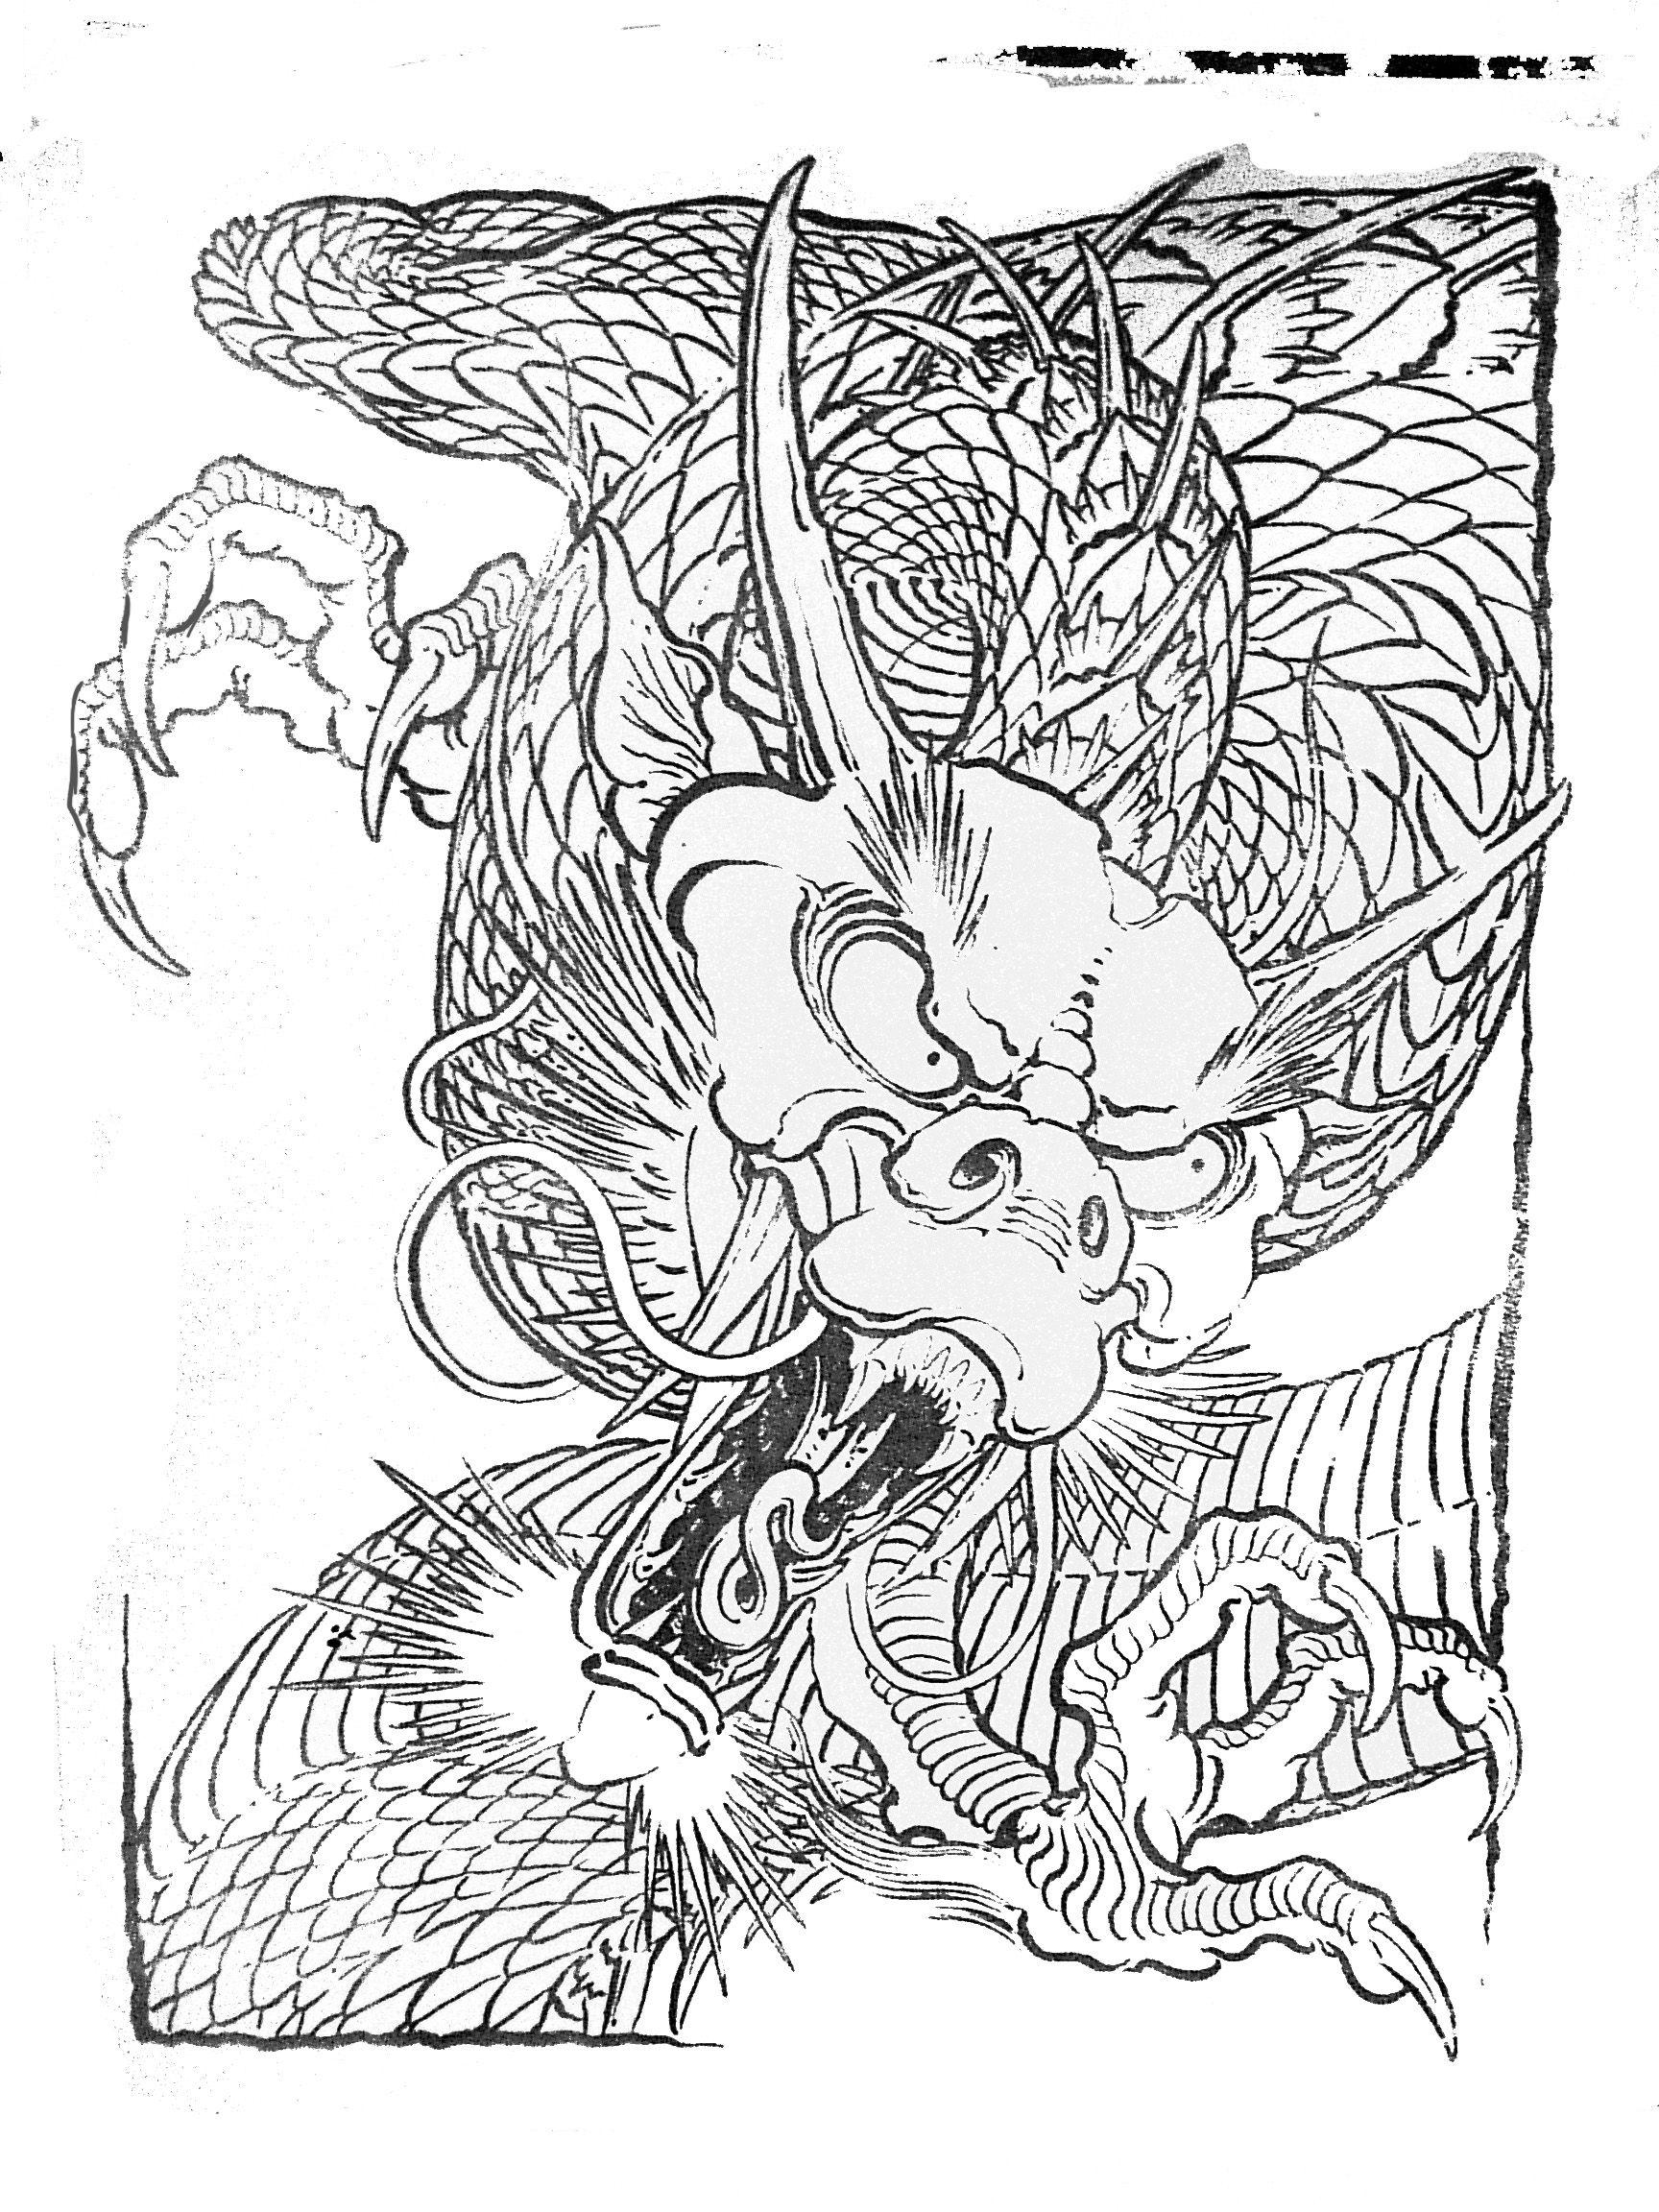 Filip Leu, Dragons. http://www.leufamilyiron.com/site/home.php